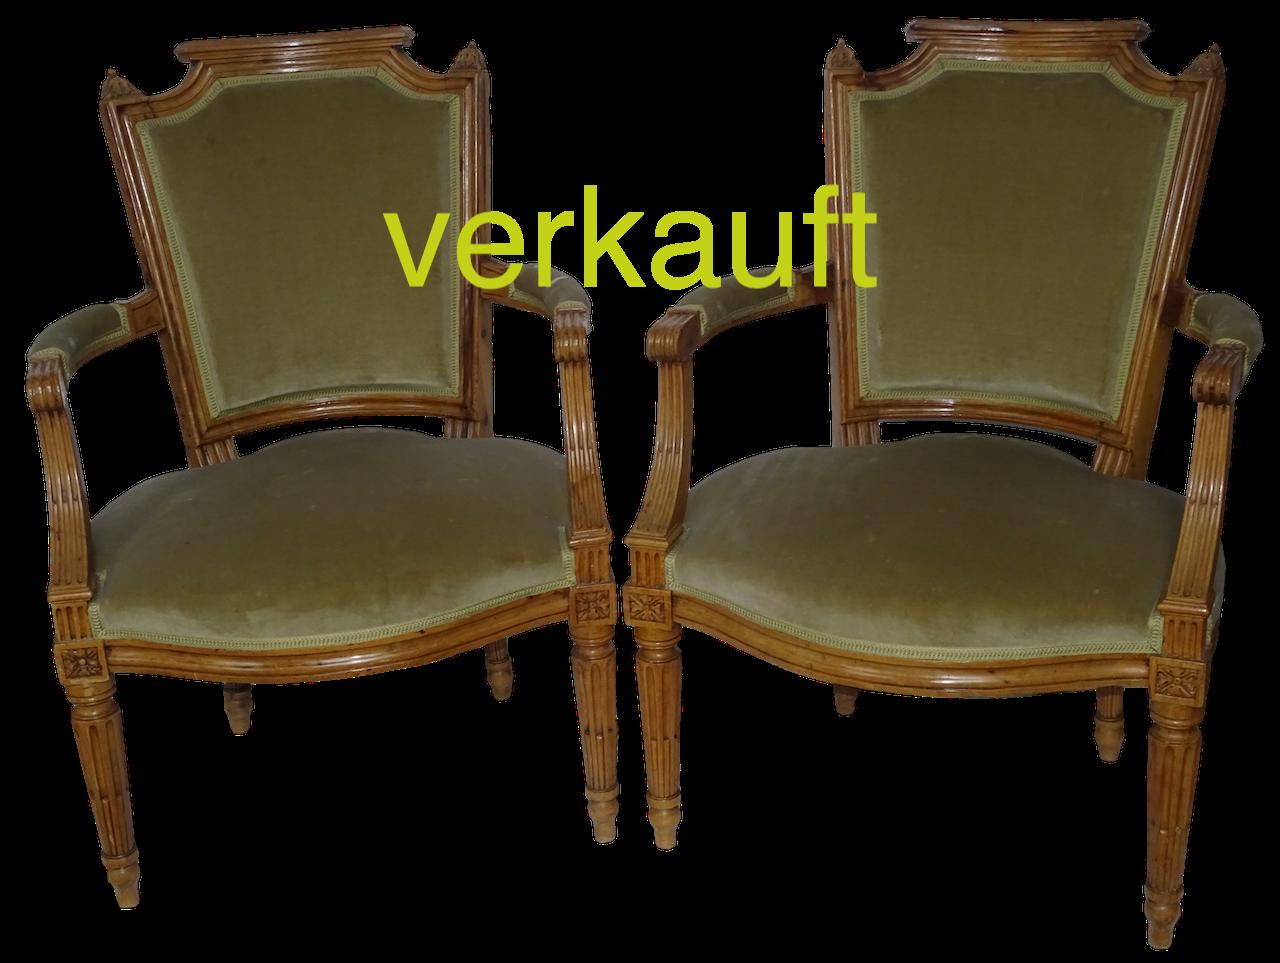 Sitzmöbel Edeltrödel Möbel Archives Verkauft Antike PkuOTXiZ